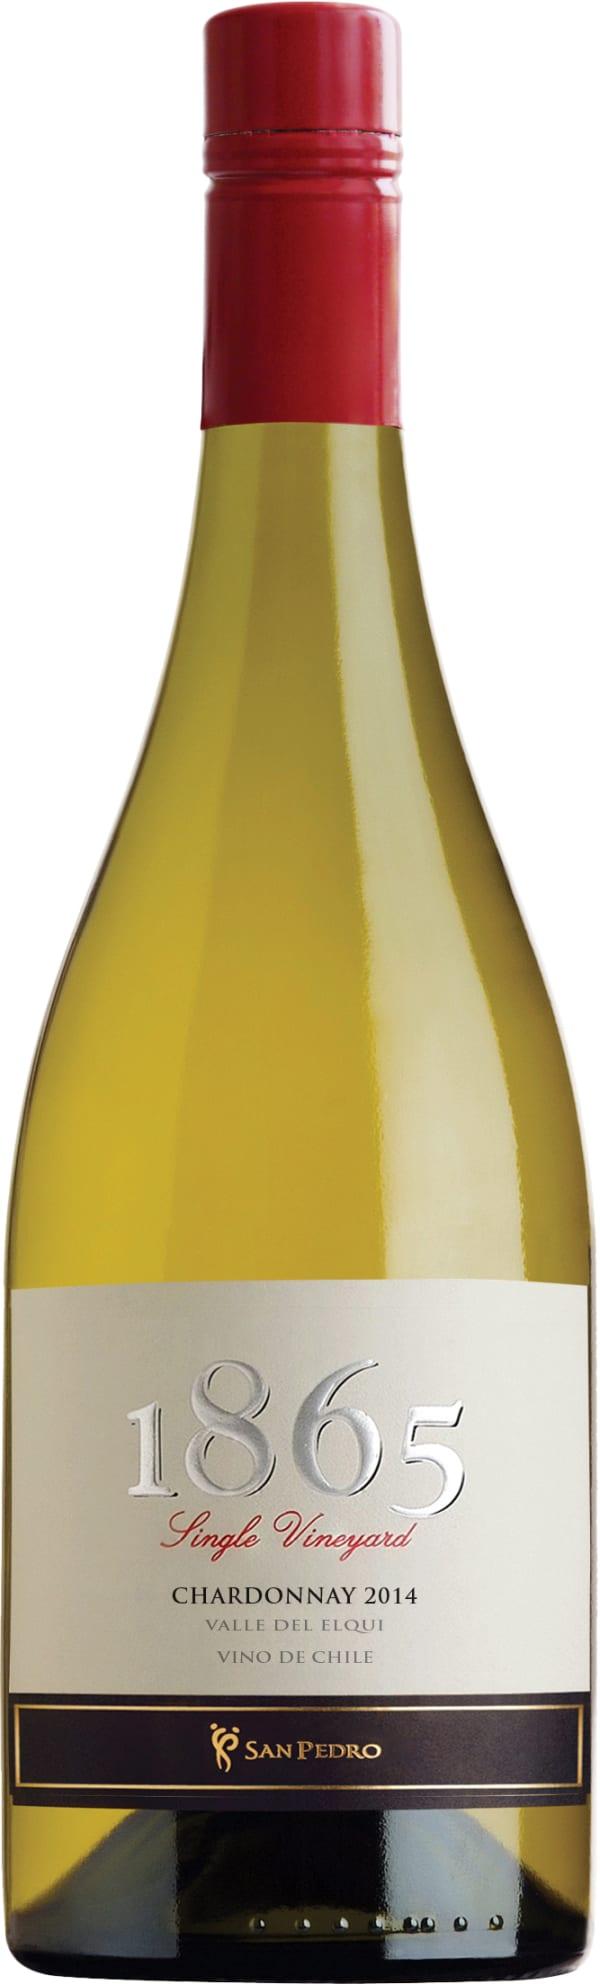 1865 Single Vineyard Chardonnay 2015